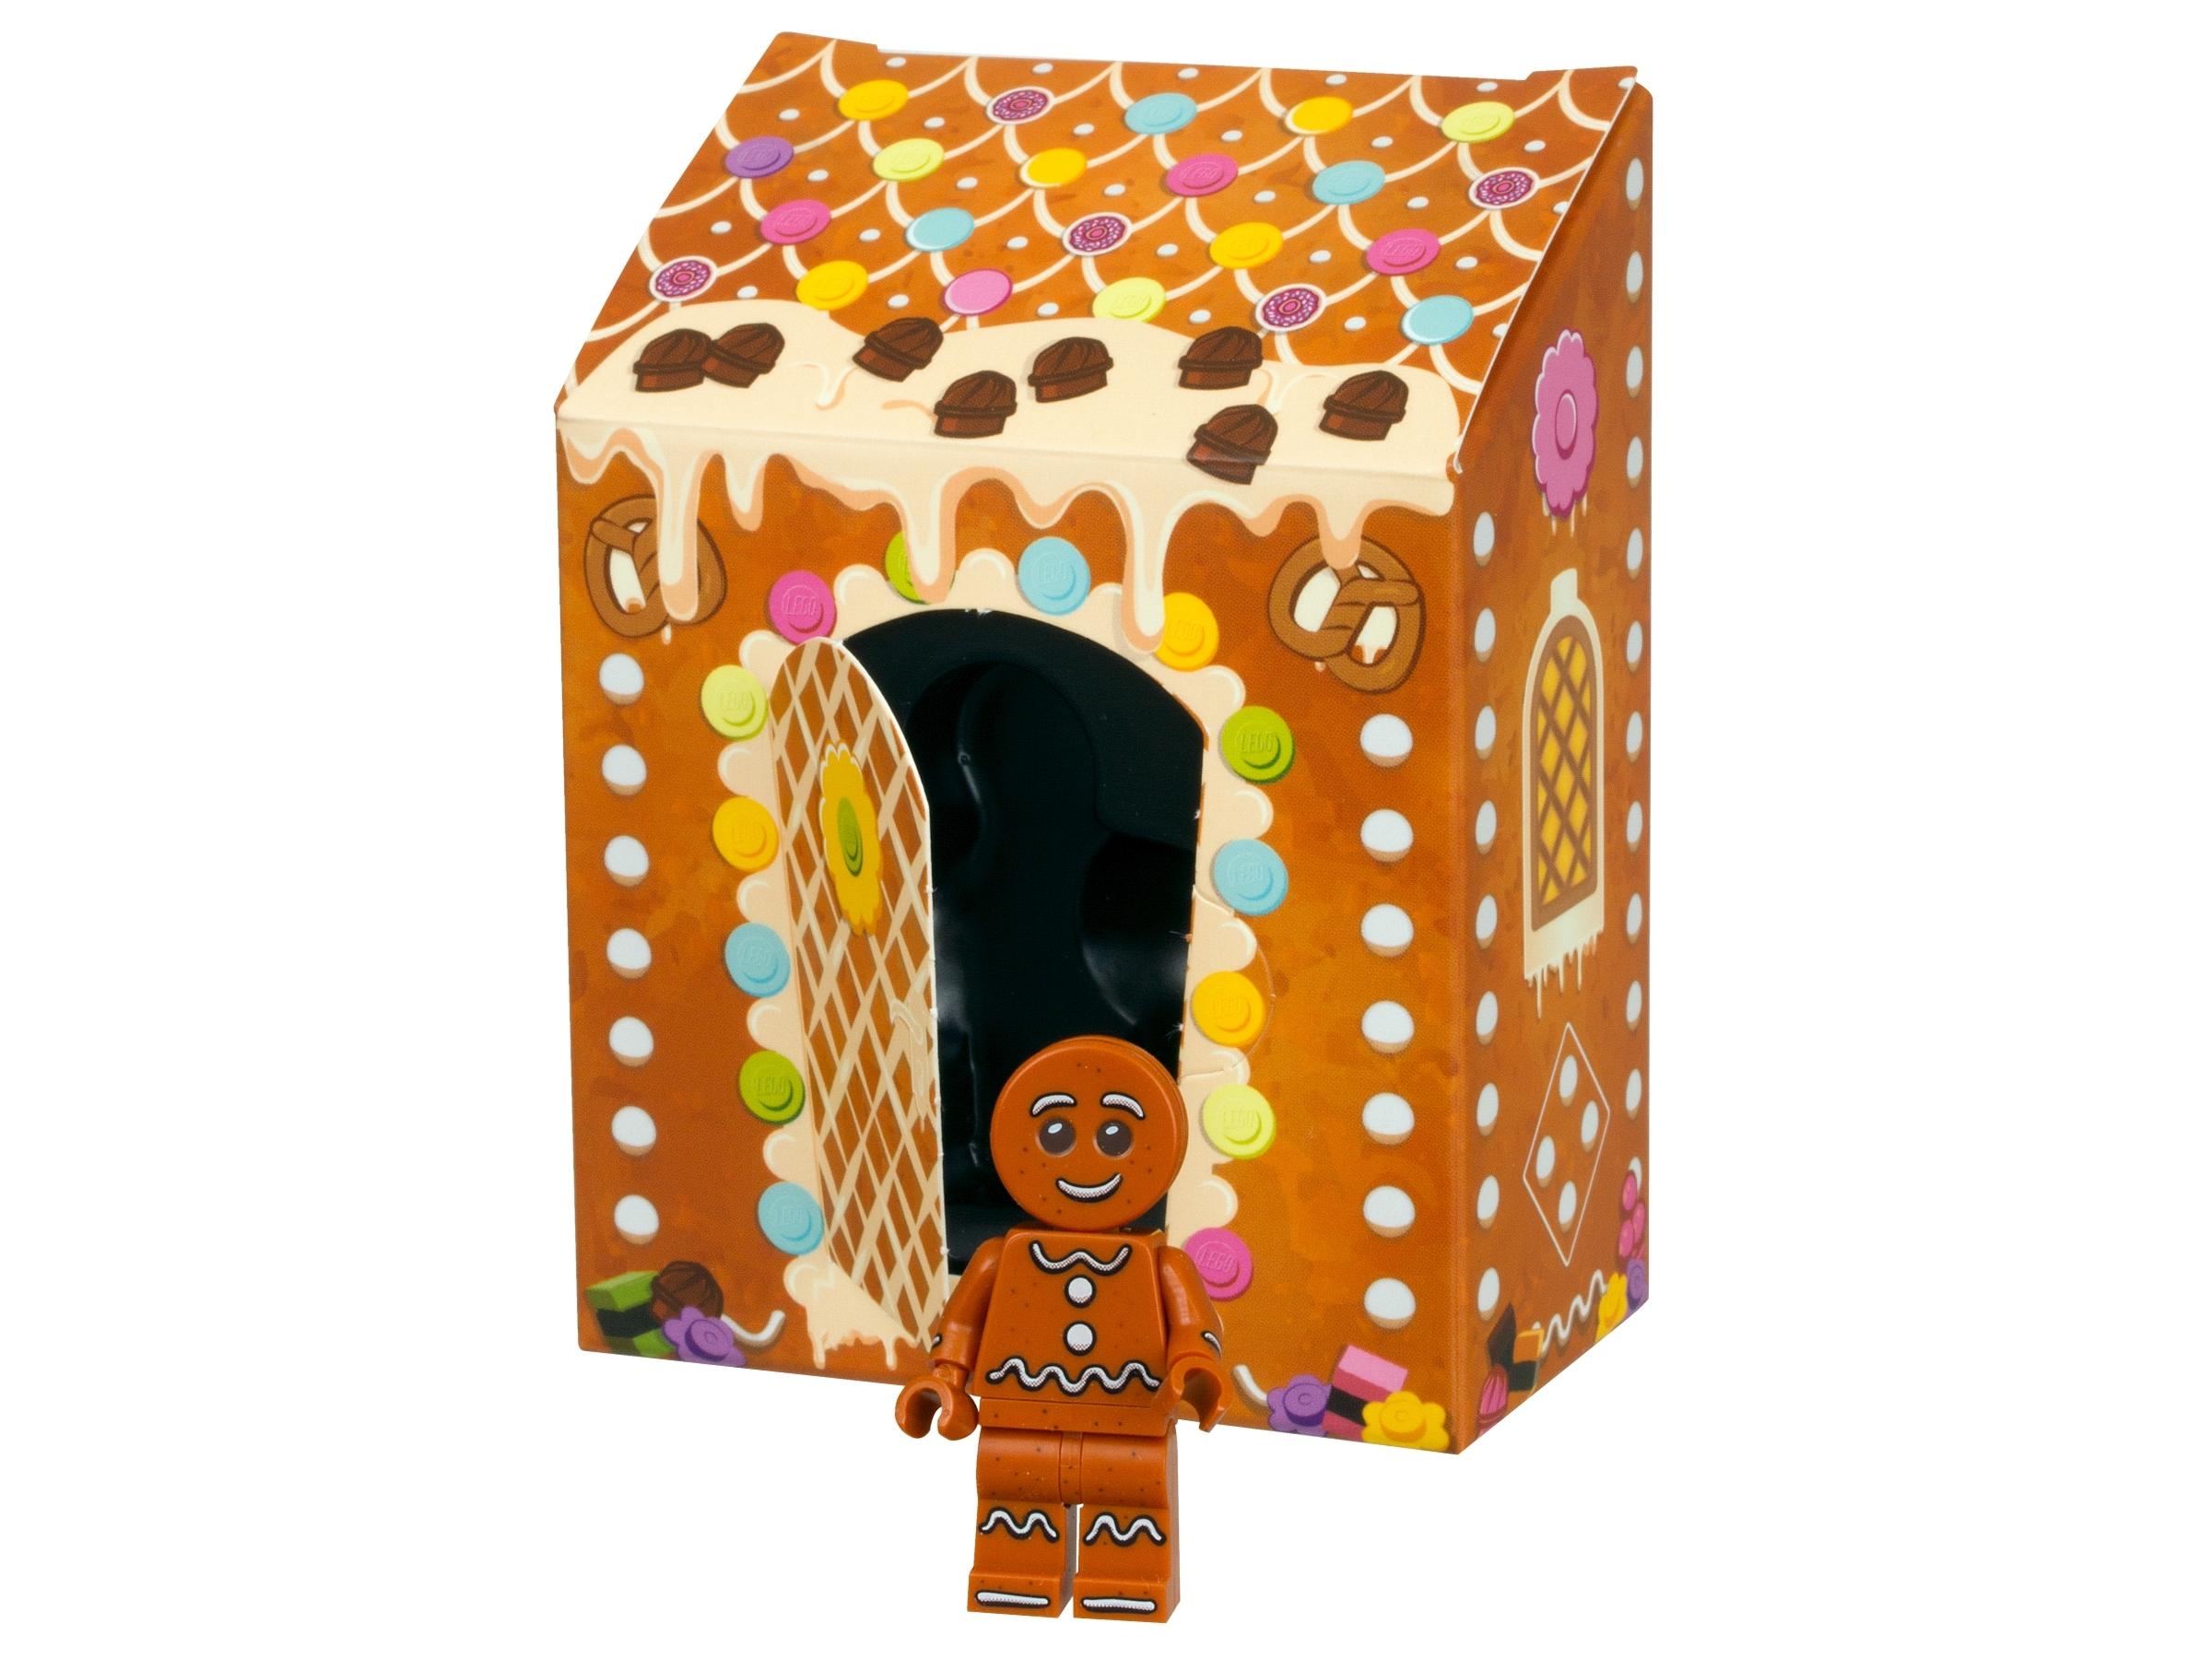 Original LEGO Gingerbread Man 5005156 New Minifigure